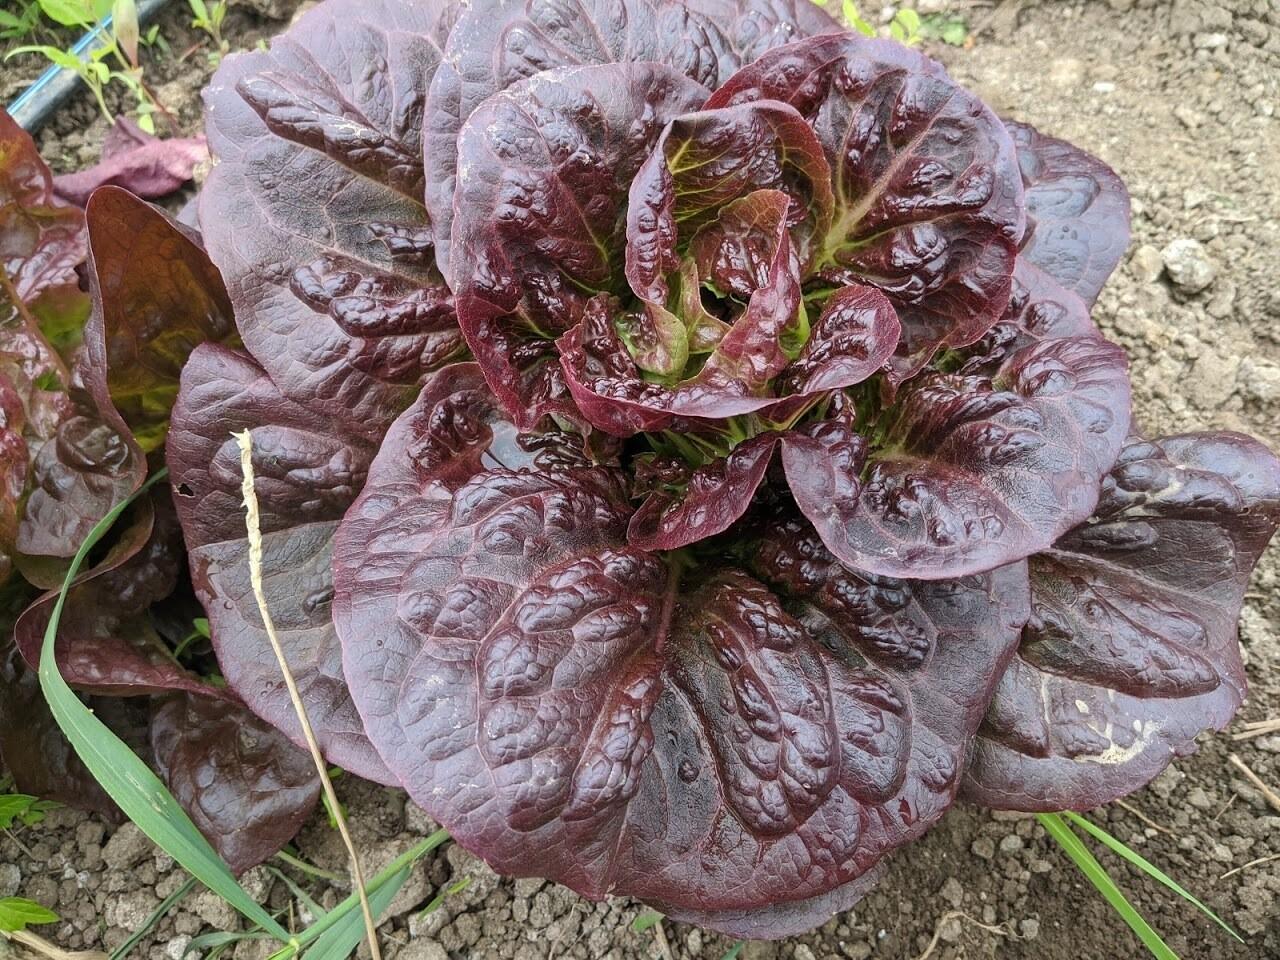 Gem Lettuce - Vitruvian Farms